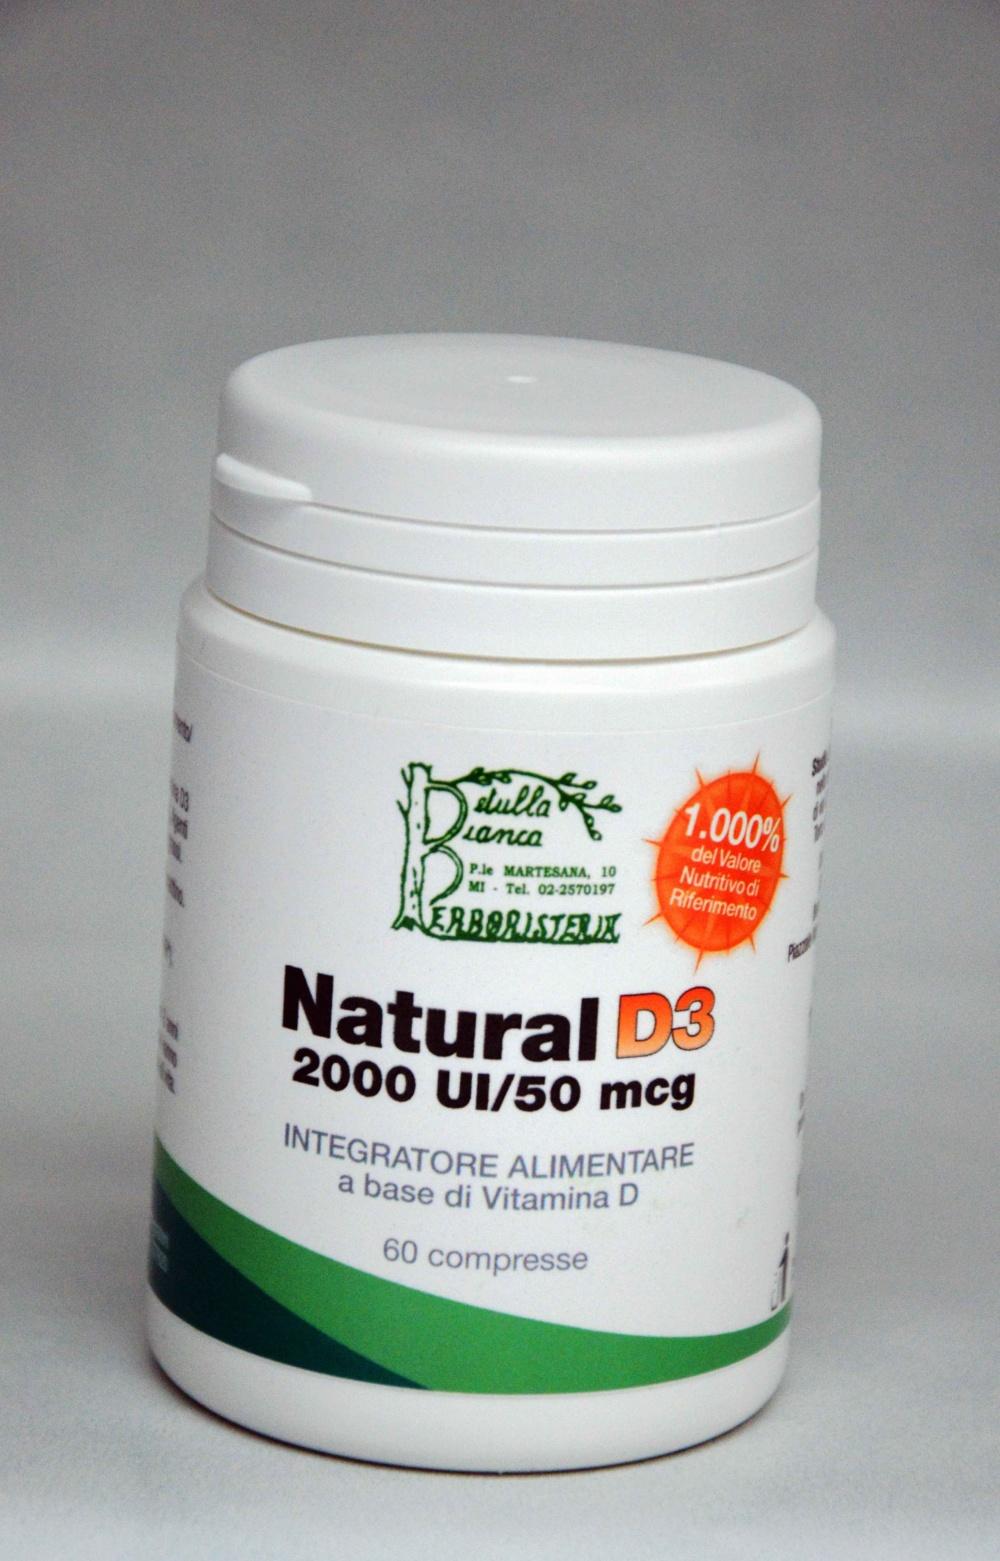 Natural D3 Vitamina D